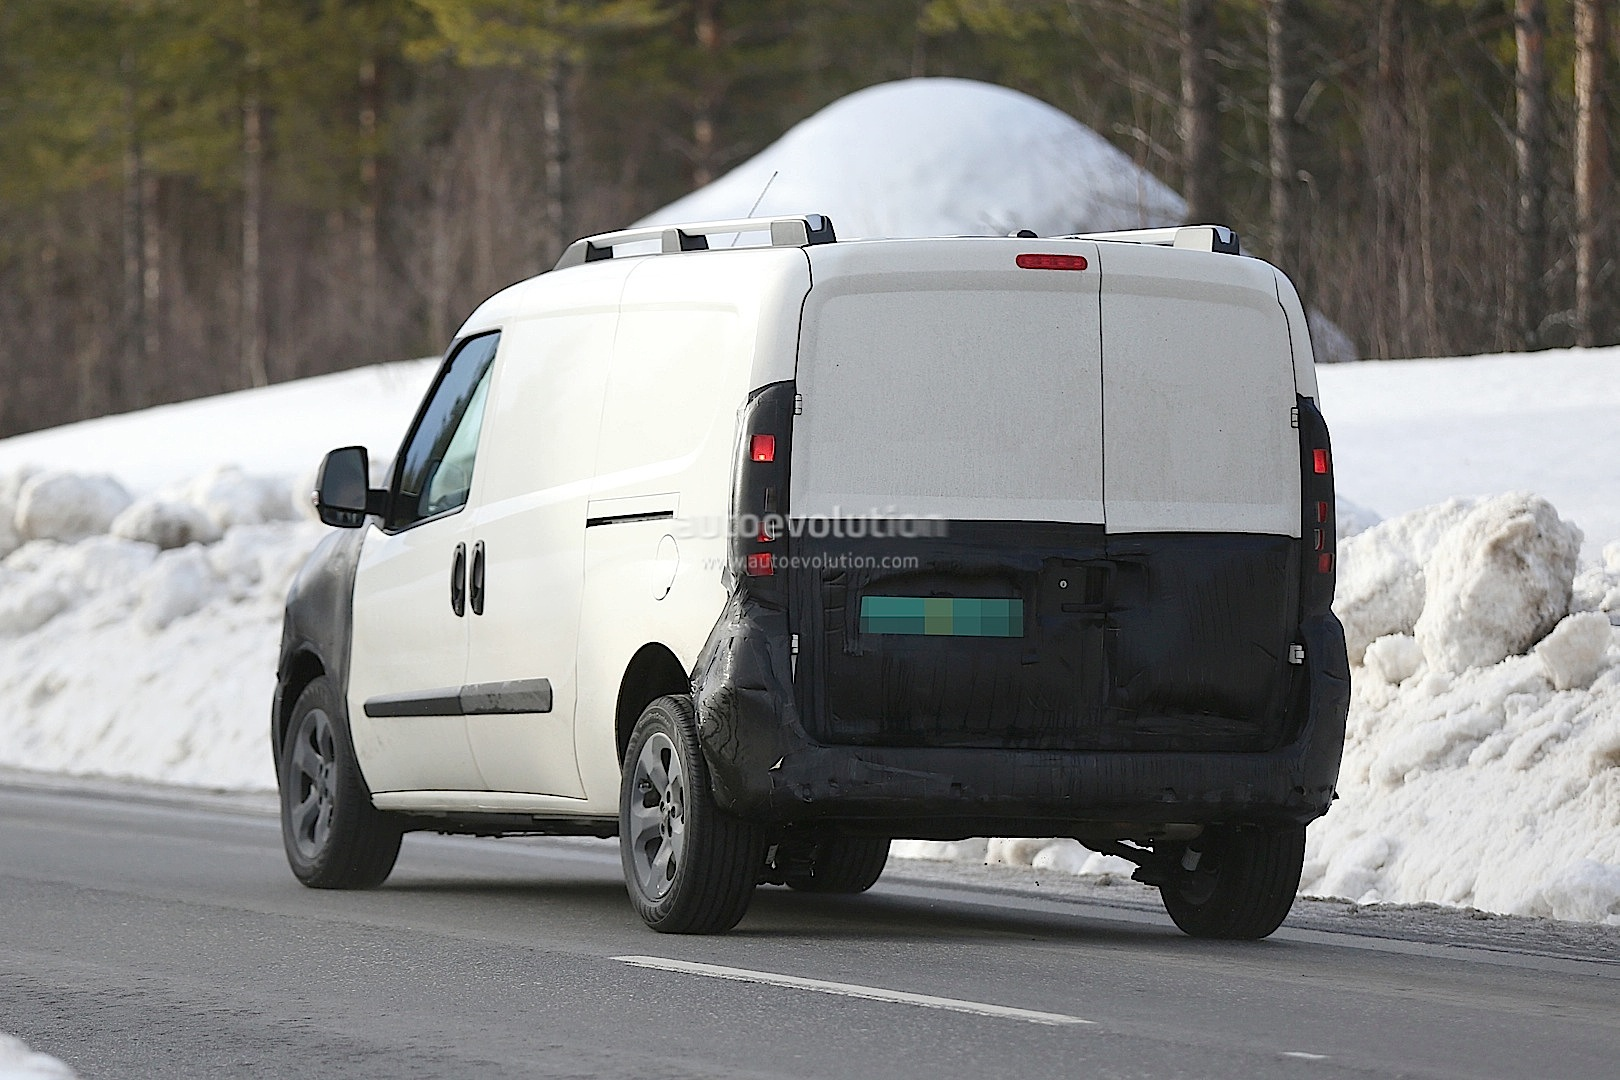 Spyshots: 2015 Fiat Doblo / Ram ProMaster City - autoevolution